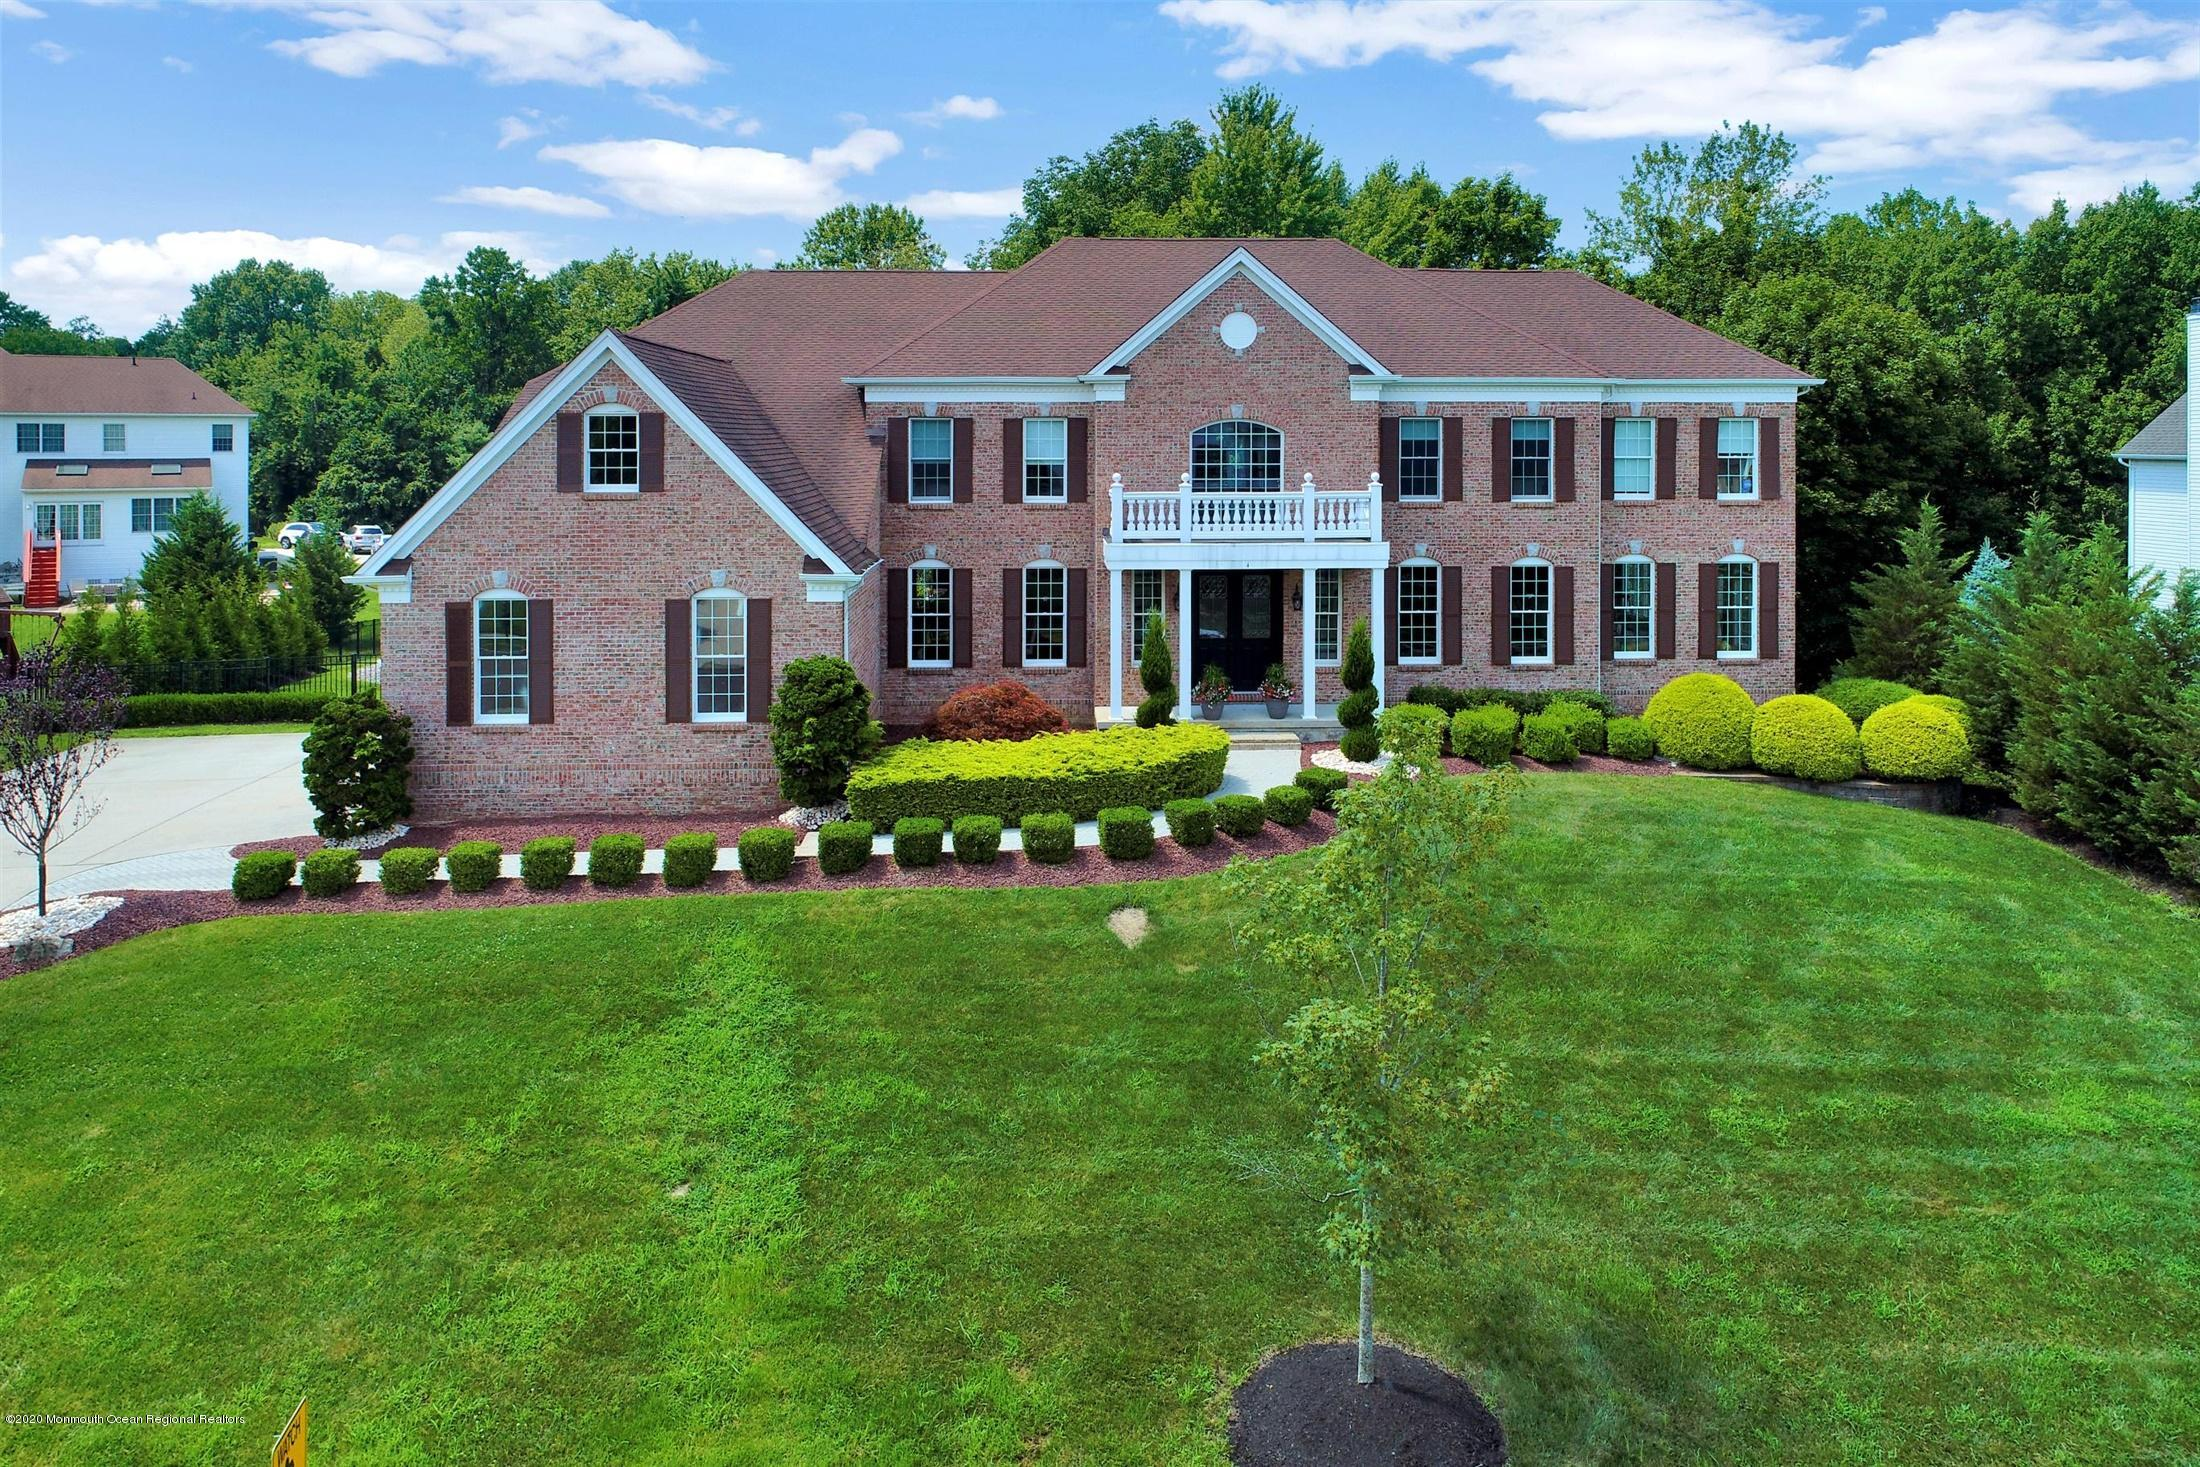 Marlboro NJ Luxury Homes for Sale | Jodi Goldberg